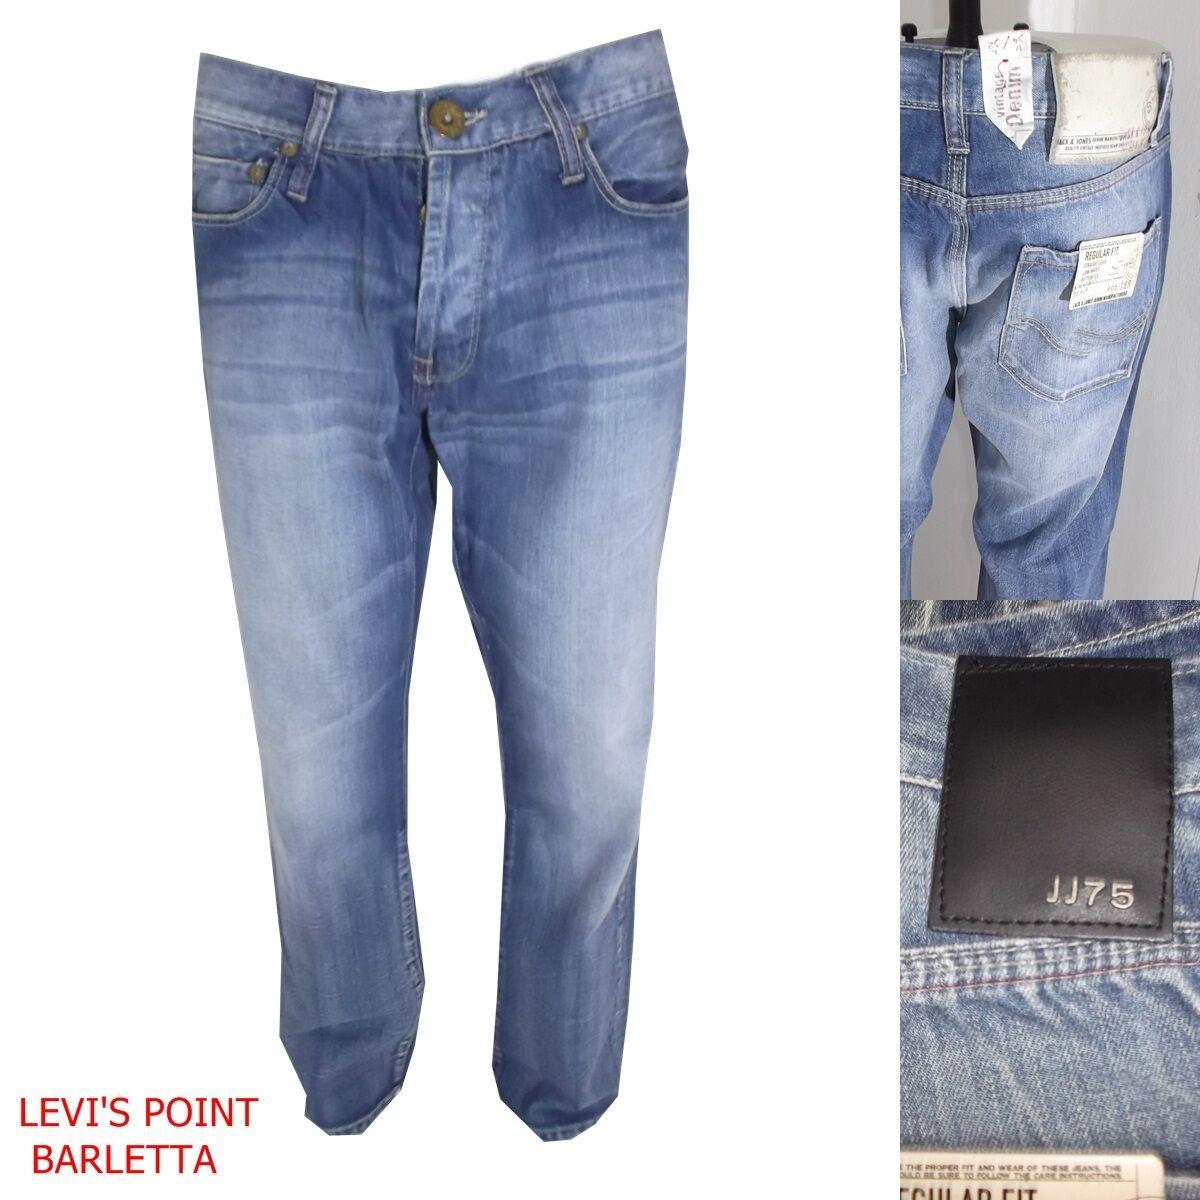 Jack&jones jeans uomo gate svasato a zampa largo azzurro taglia W33 W34 nuovo